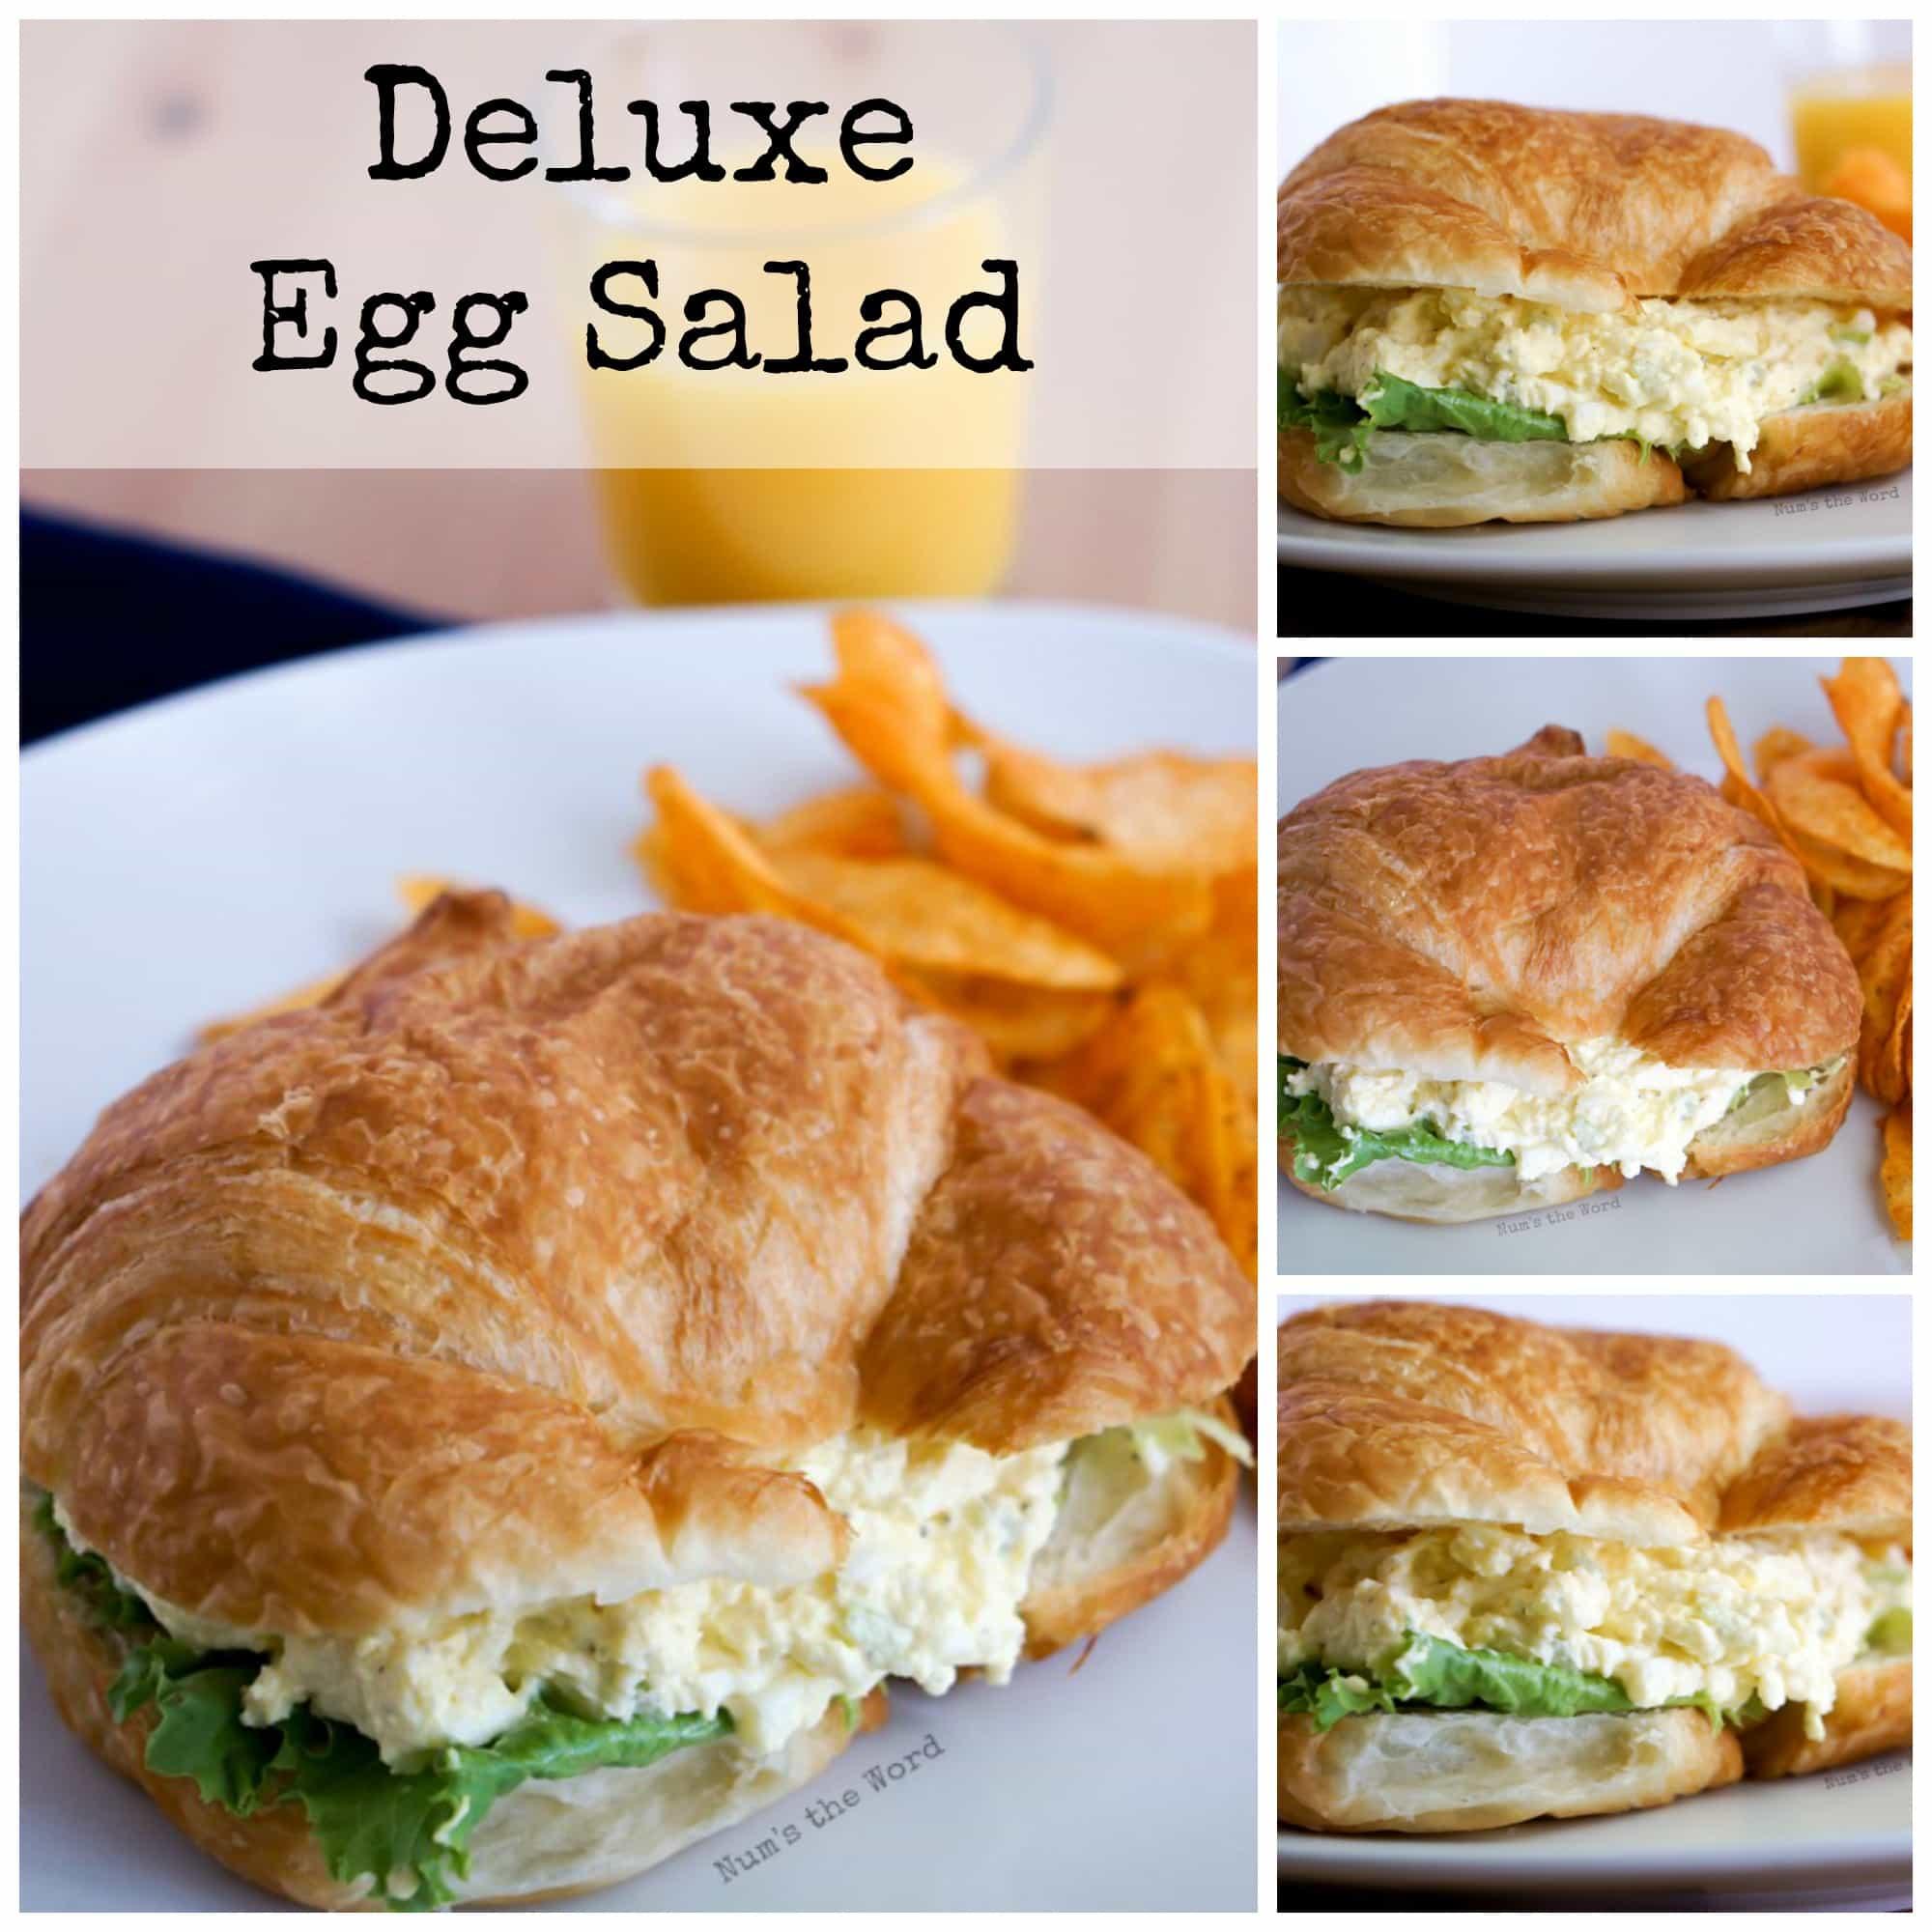 Deluxe Egg Salad - Facebook collage of photos